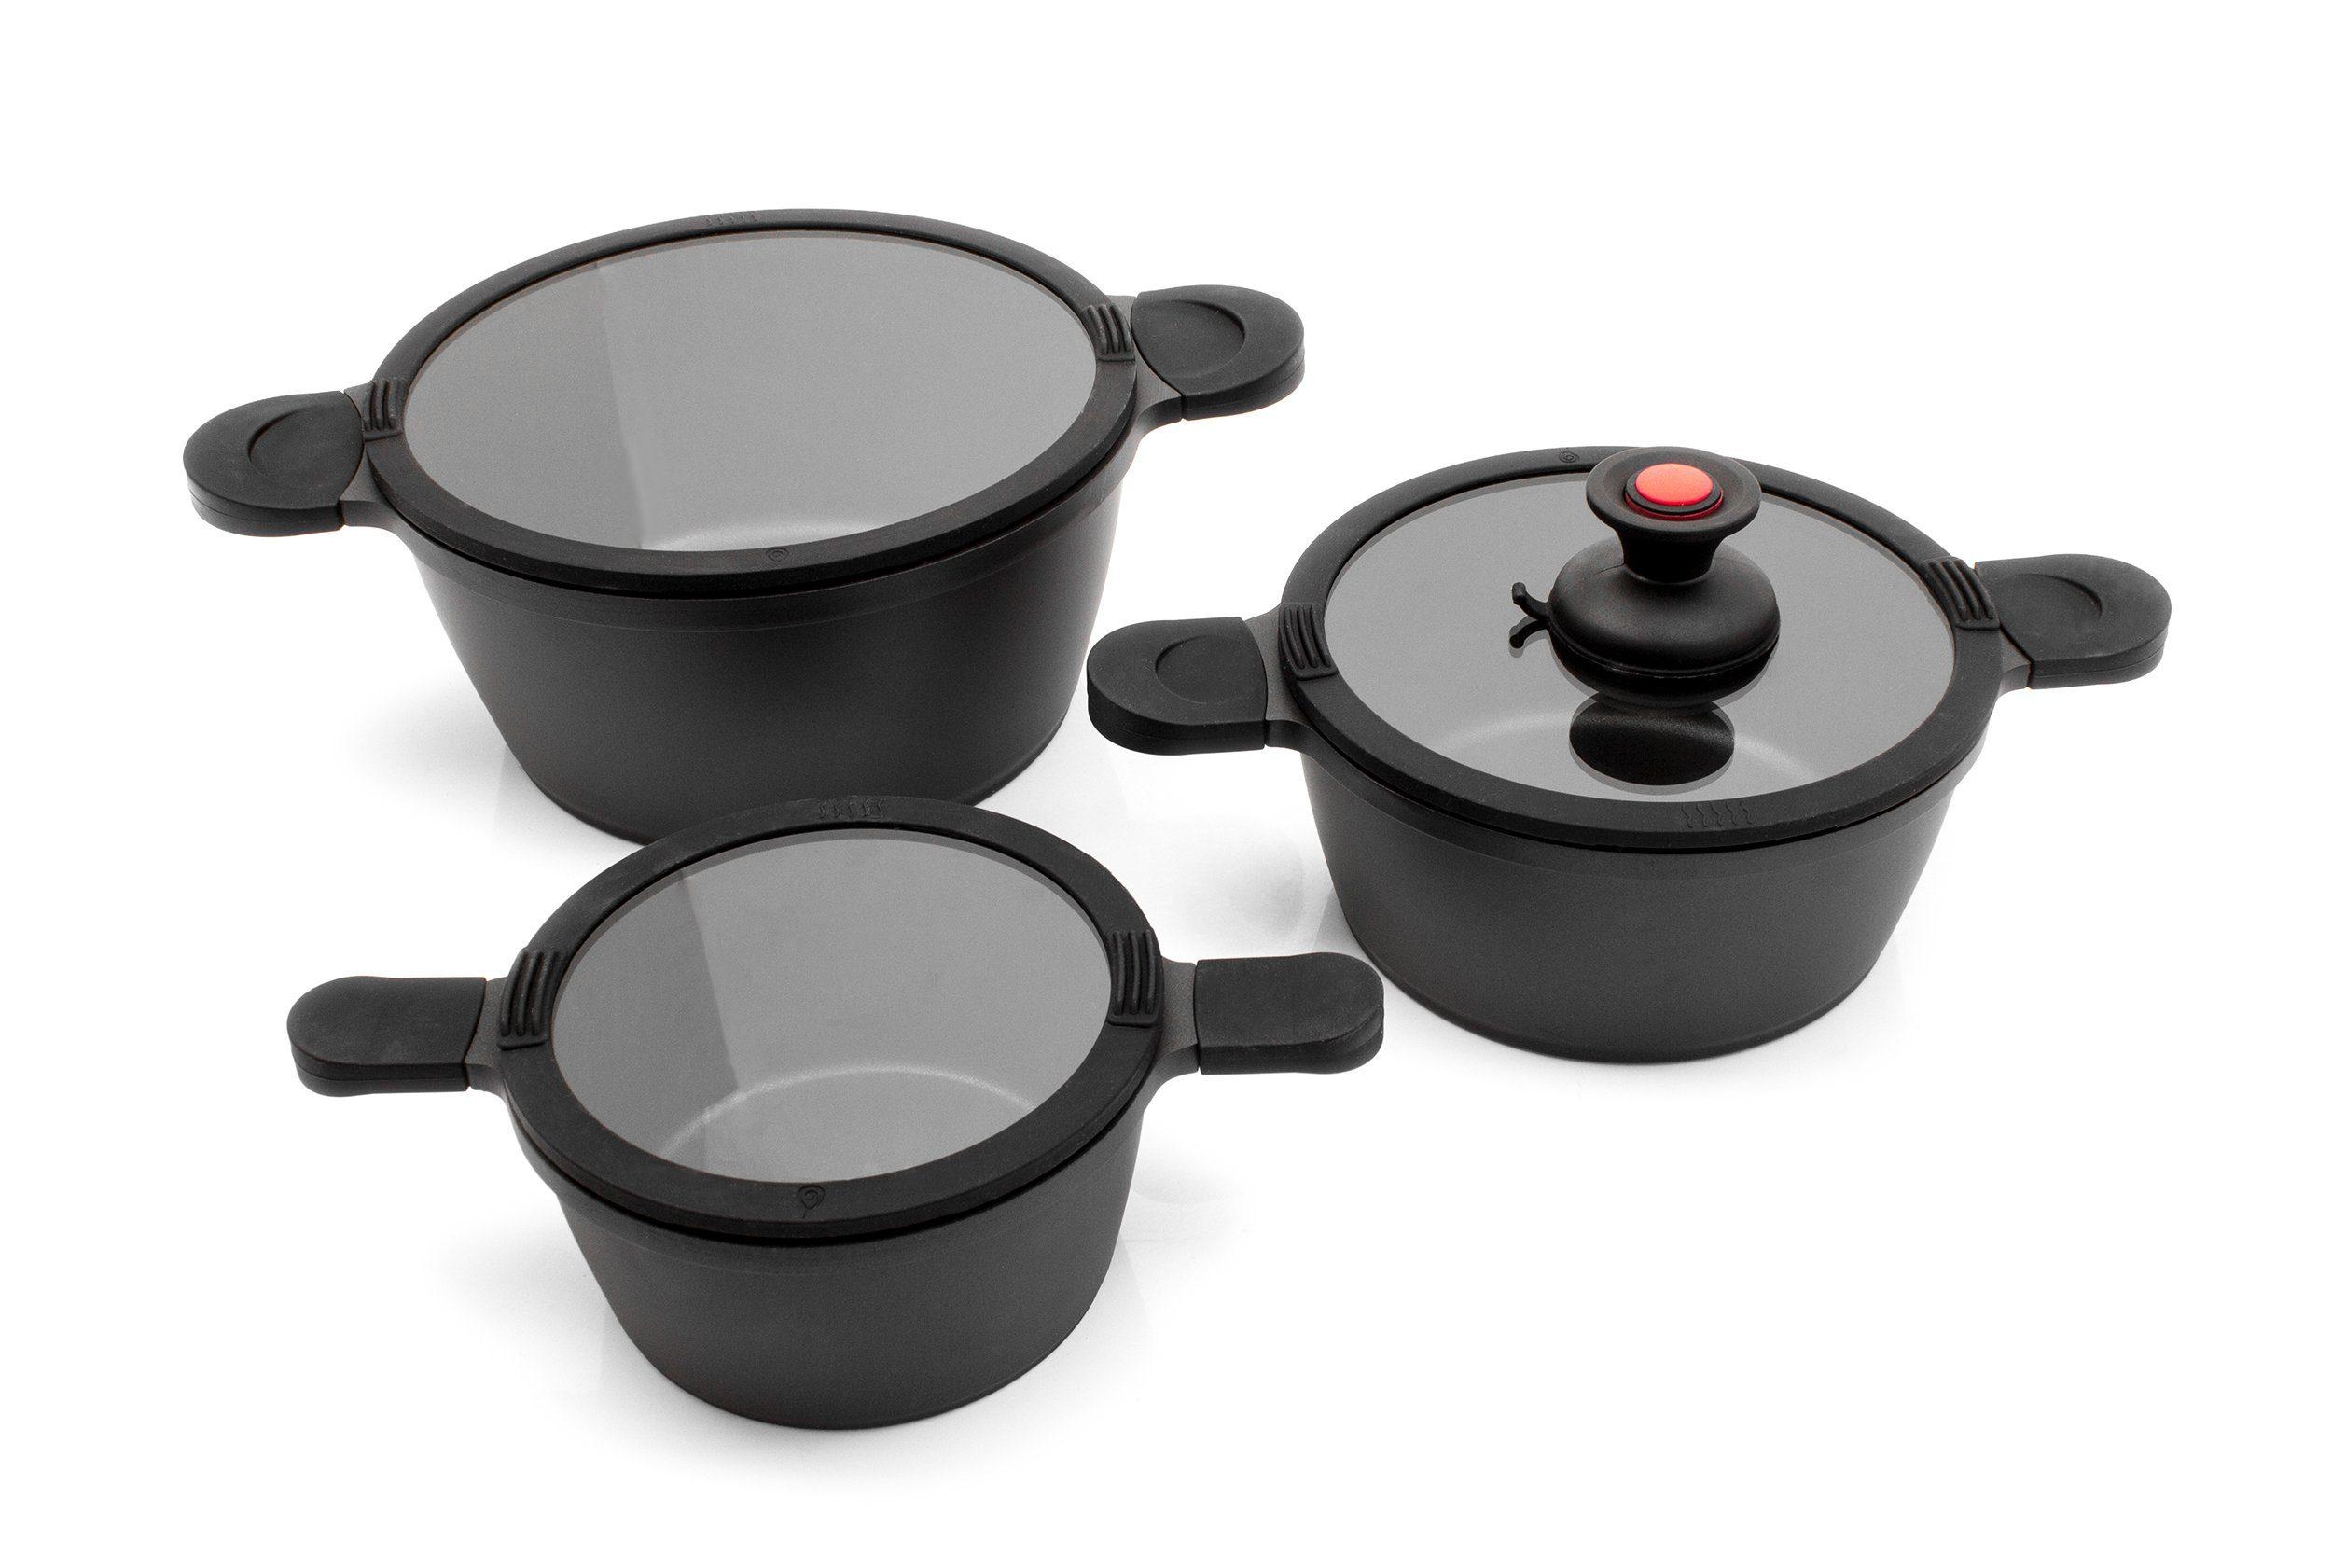 Karcher Topf-Set Toni, Aluminiumguss, (Set), mit Sauggriff schwarz Topfsets Töpfe Haushaltswaren Topf